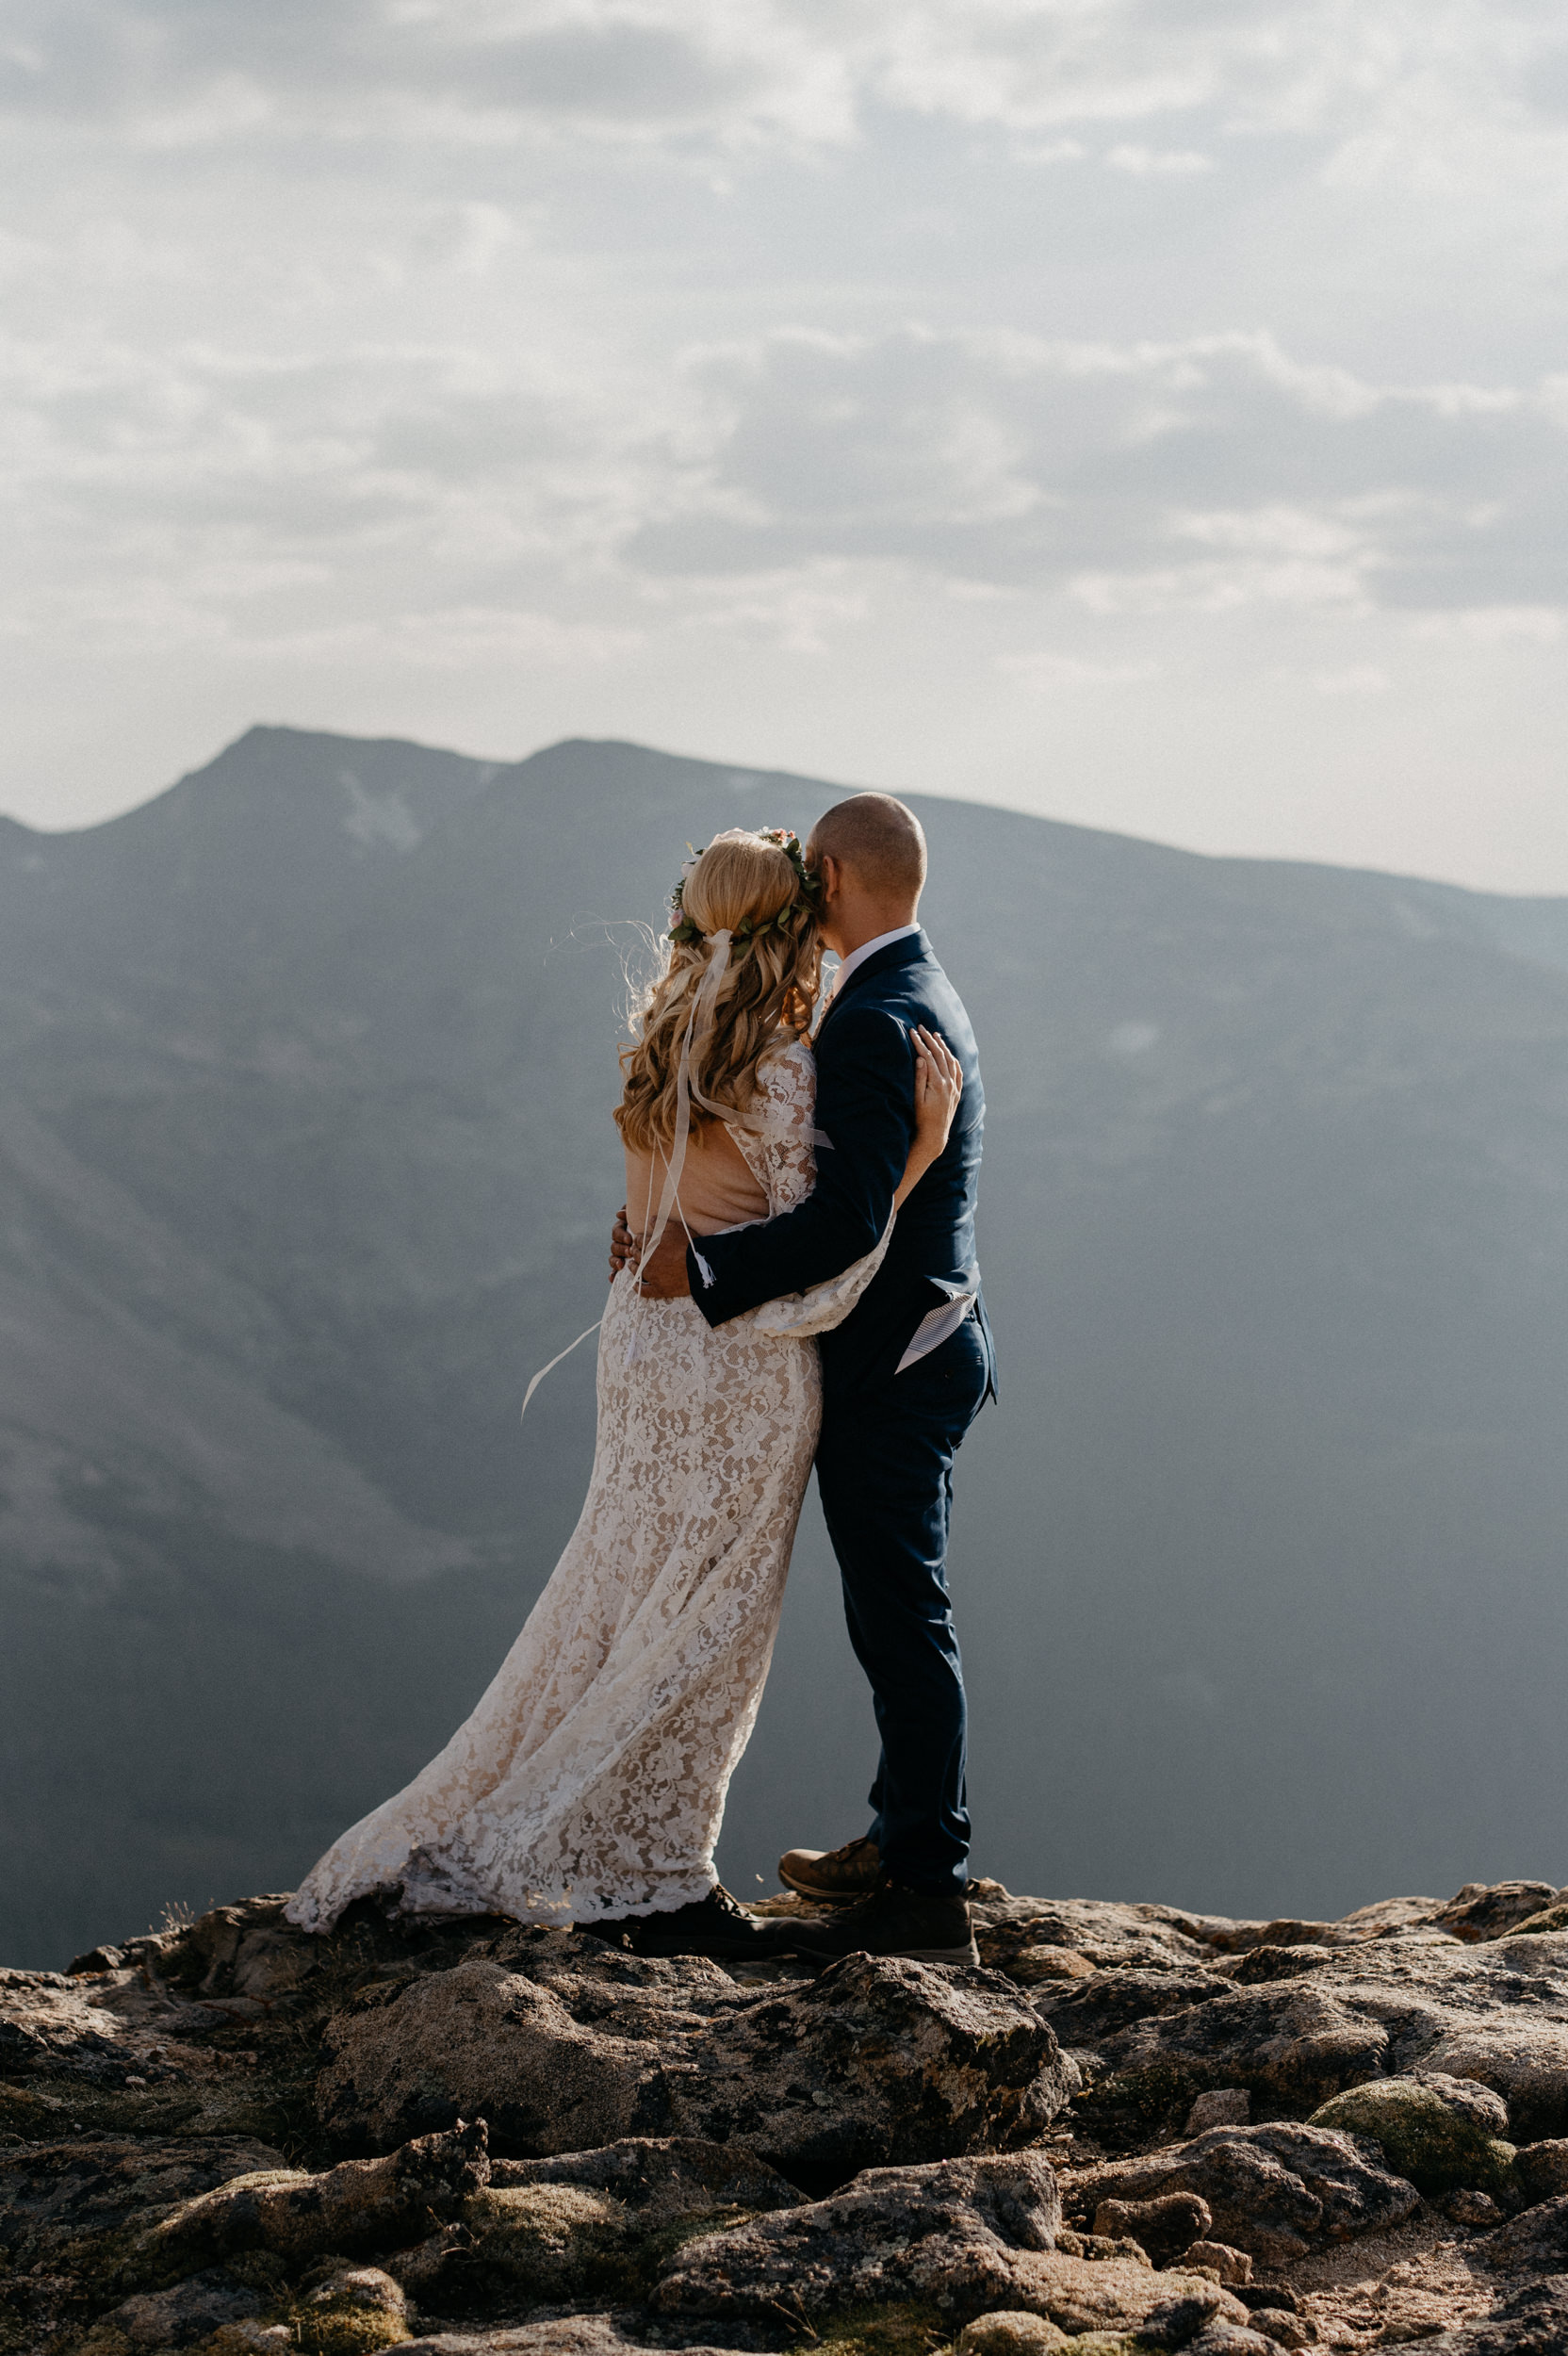 Colorado wedding photographer for adventurous elopements and mountain weddings.